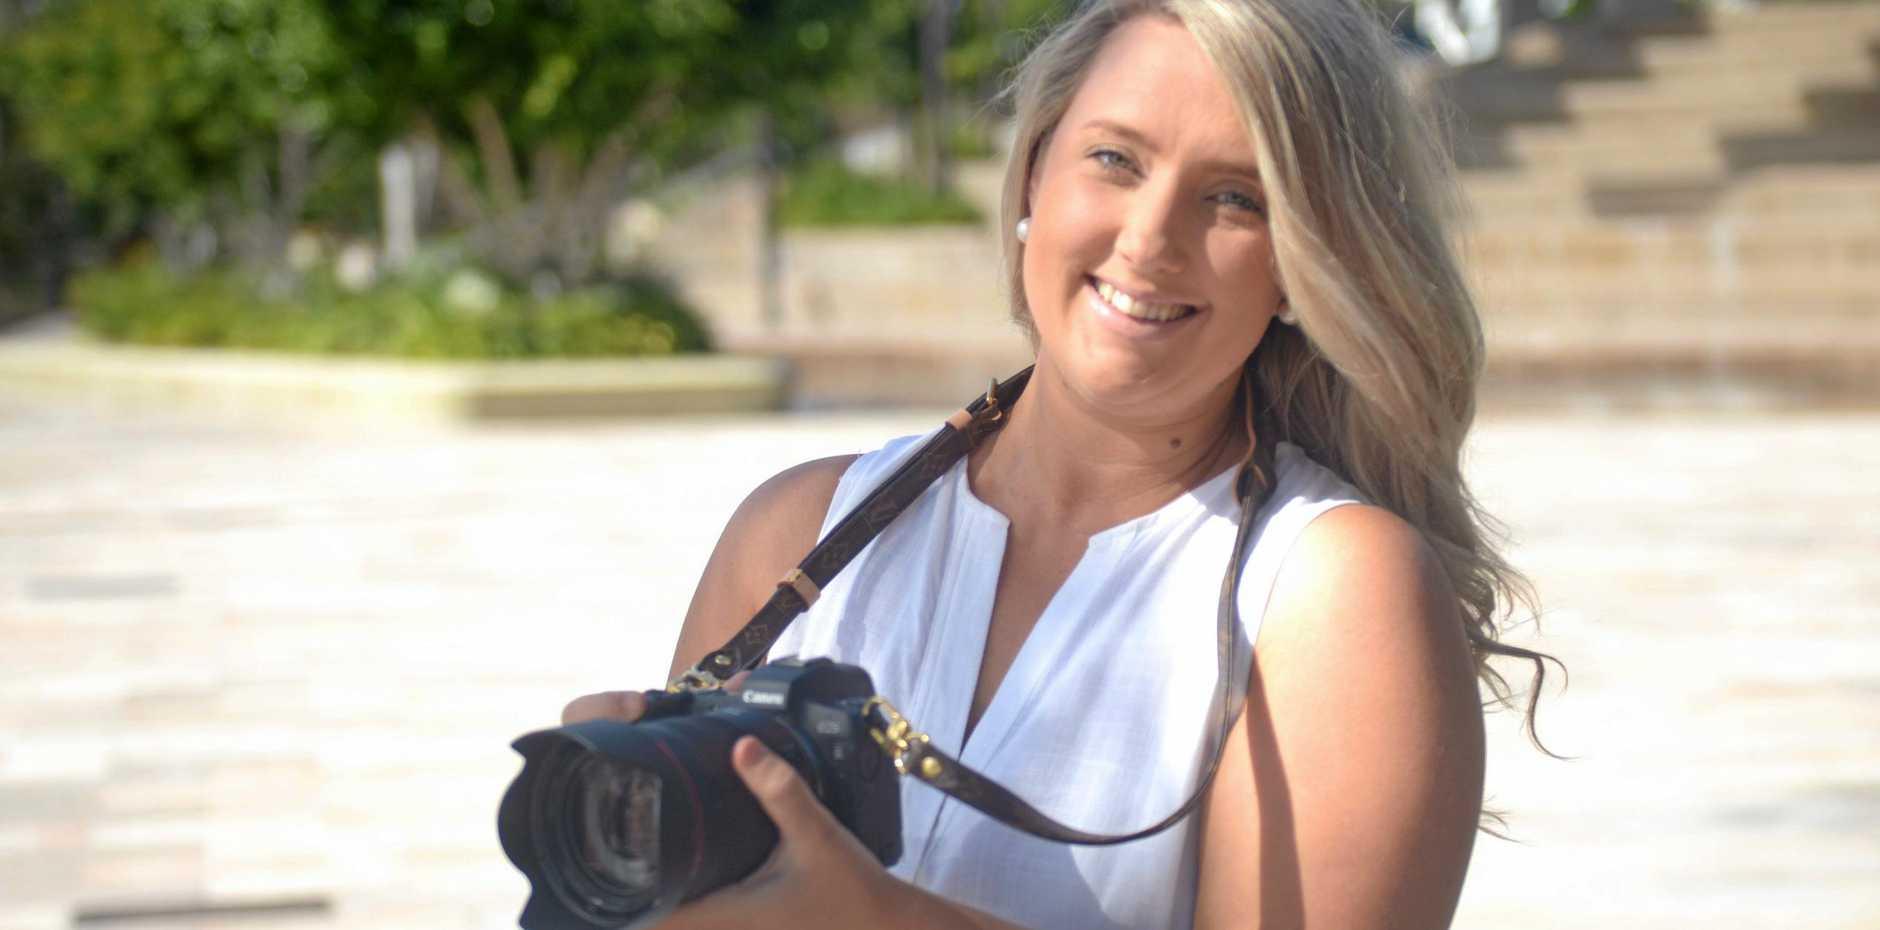 Selena Sheppard, photographer